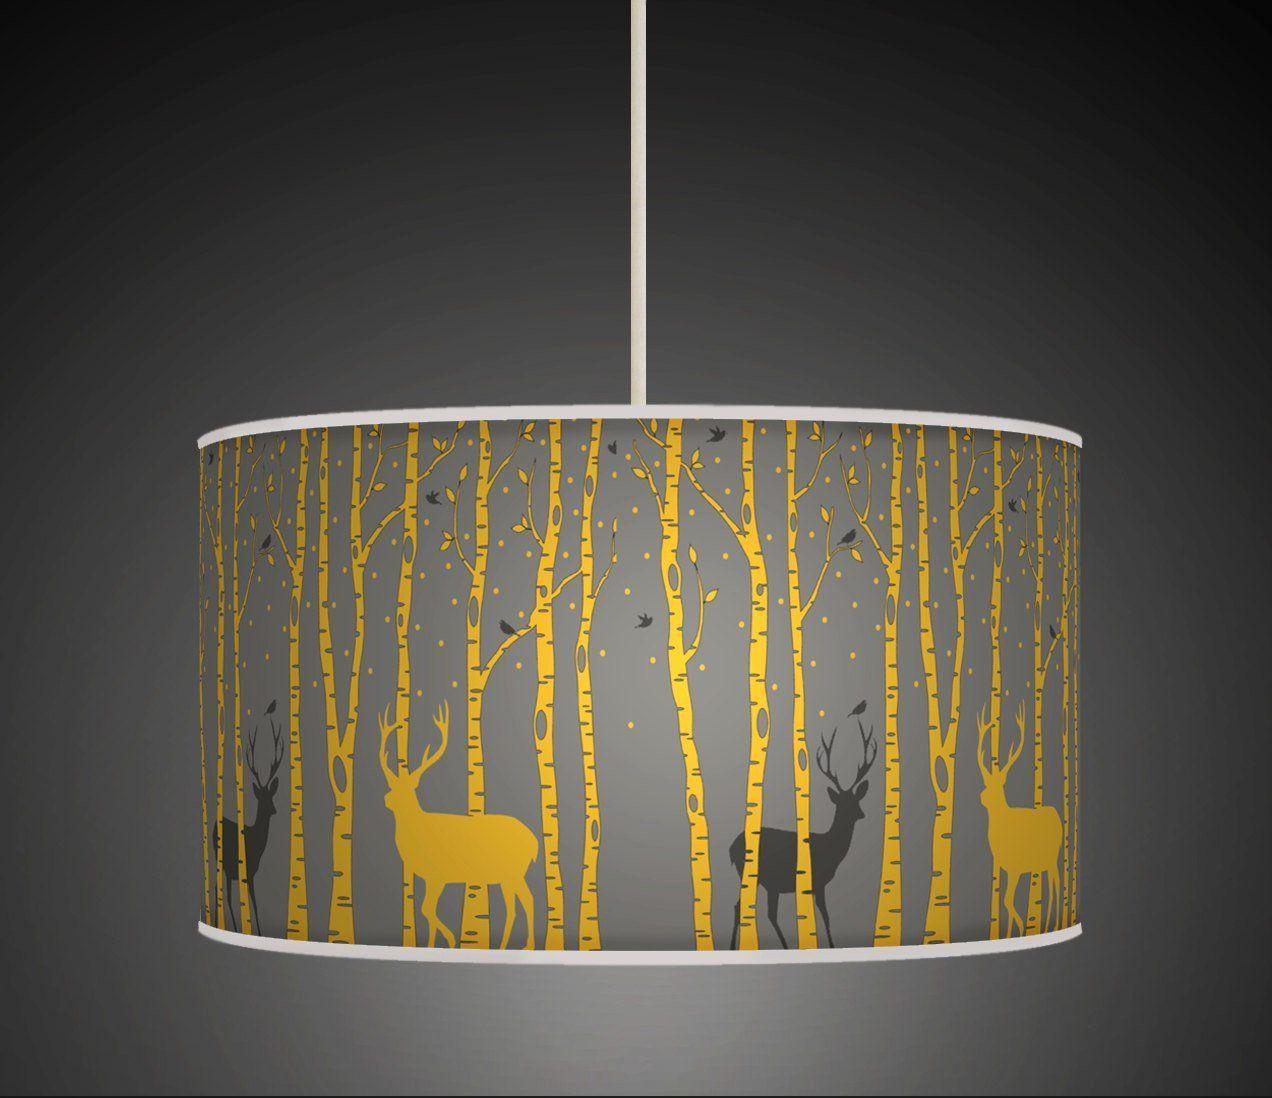 40cm 16 Trees Stag Deer Mustard Yellow Grey Retro Handmade Giclee Style Printed Fabric Lamp Drum Lampshade Floor Ceiling Pendant Light Shade 632 Amazo Lampak